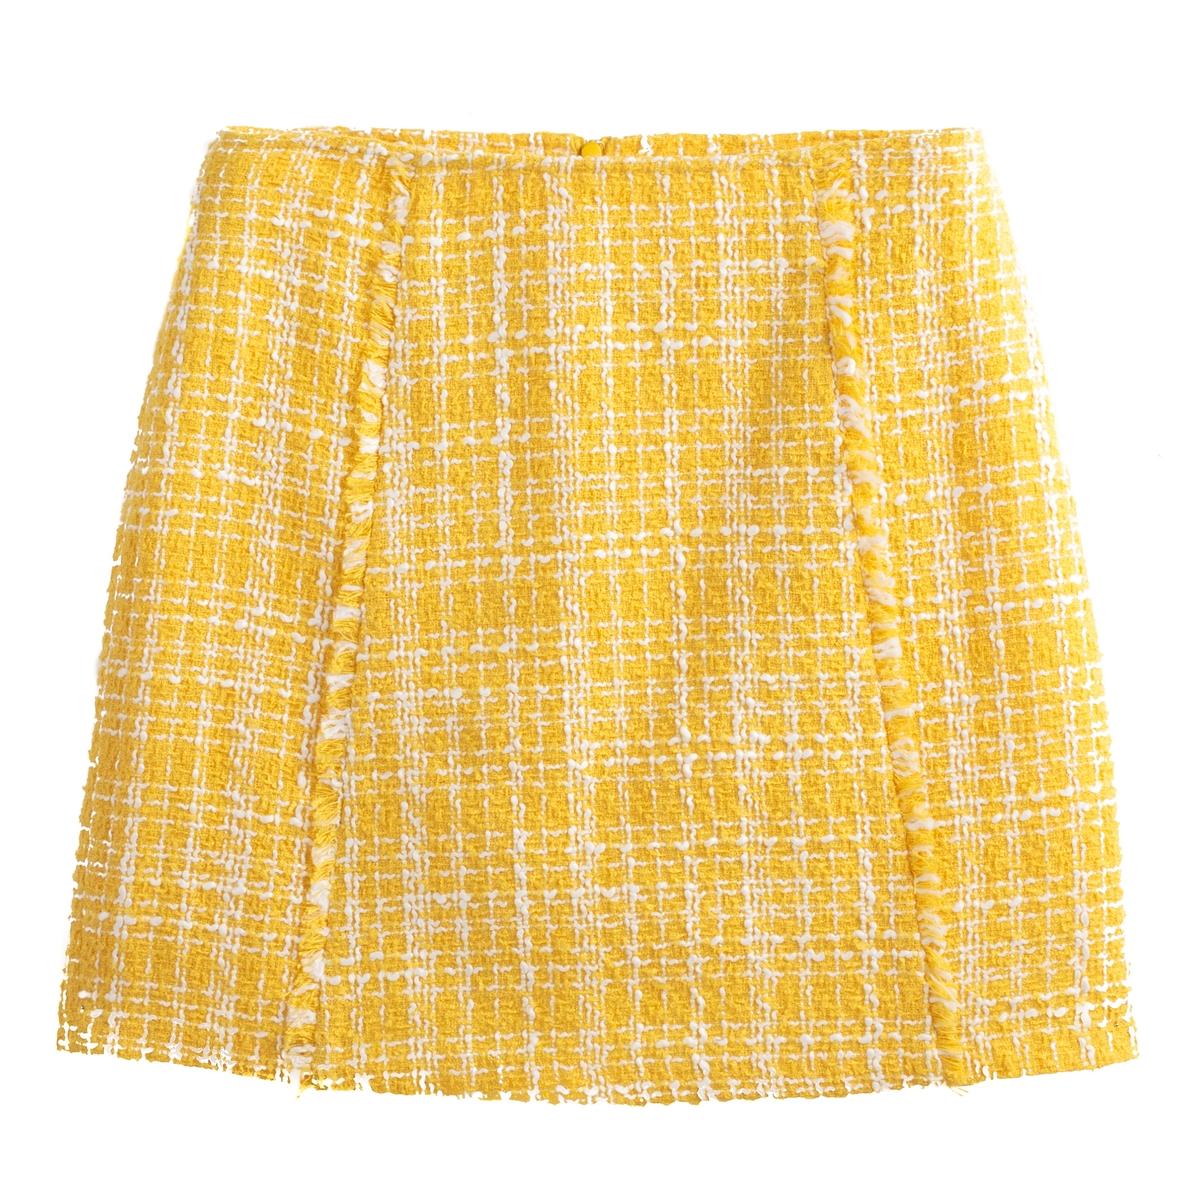 Falda recta estilo couture